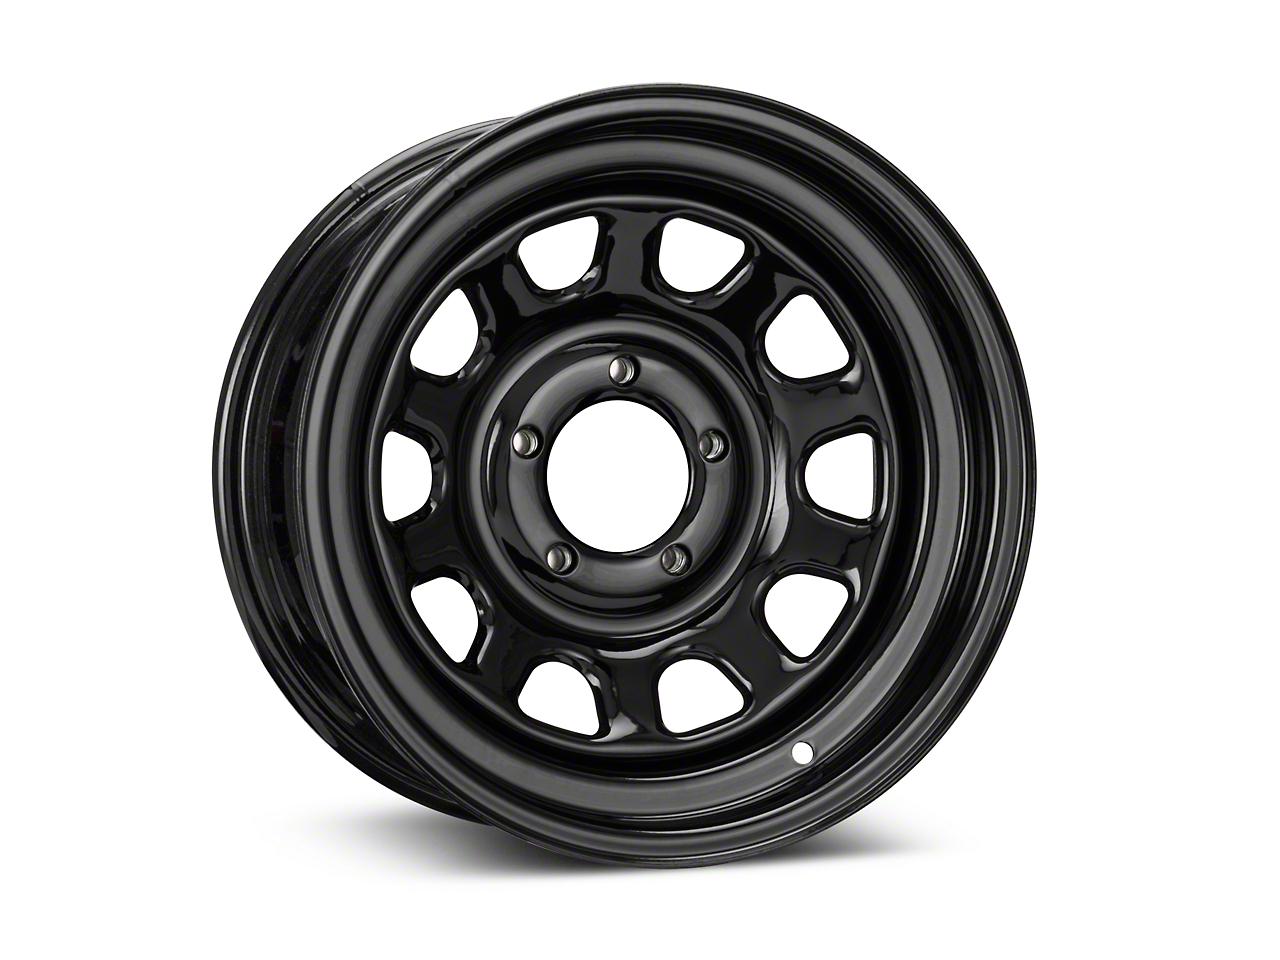 Pro Comp Steel Series 52 Rock Crawler Gloss Black Wheel - 15x7 (87-06 Jeep Wrangler YJ & TJ)